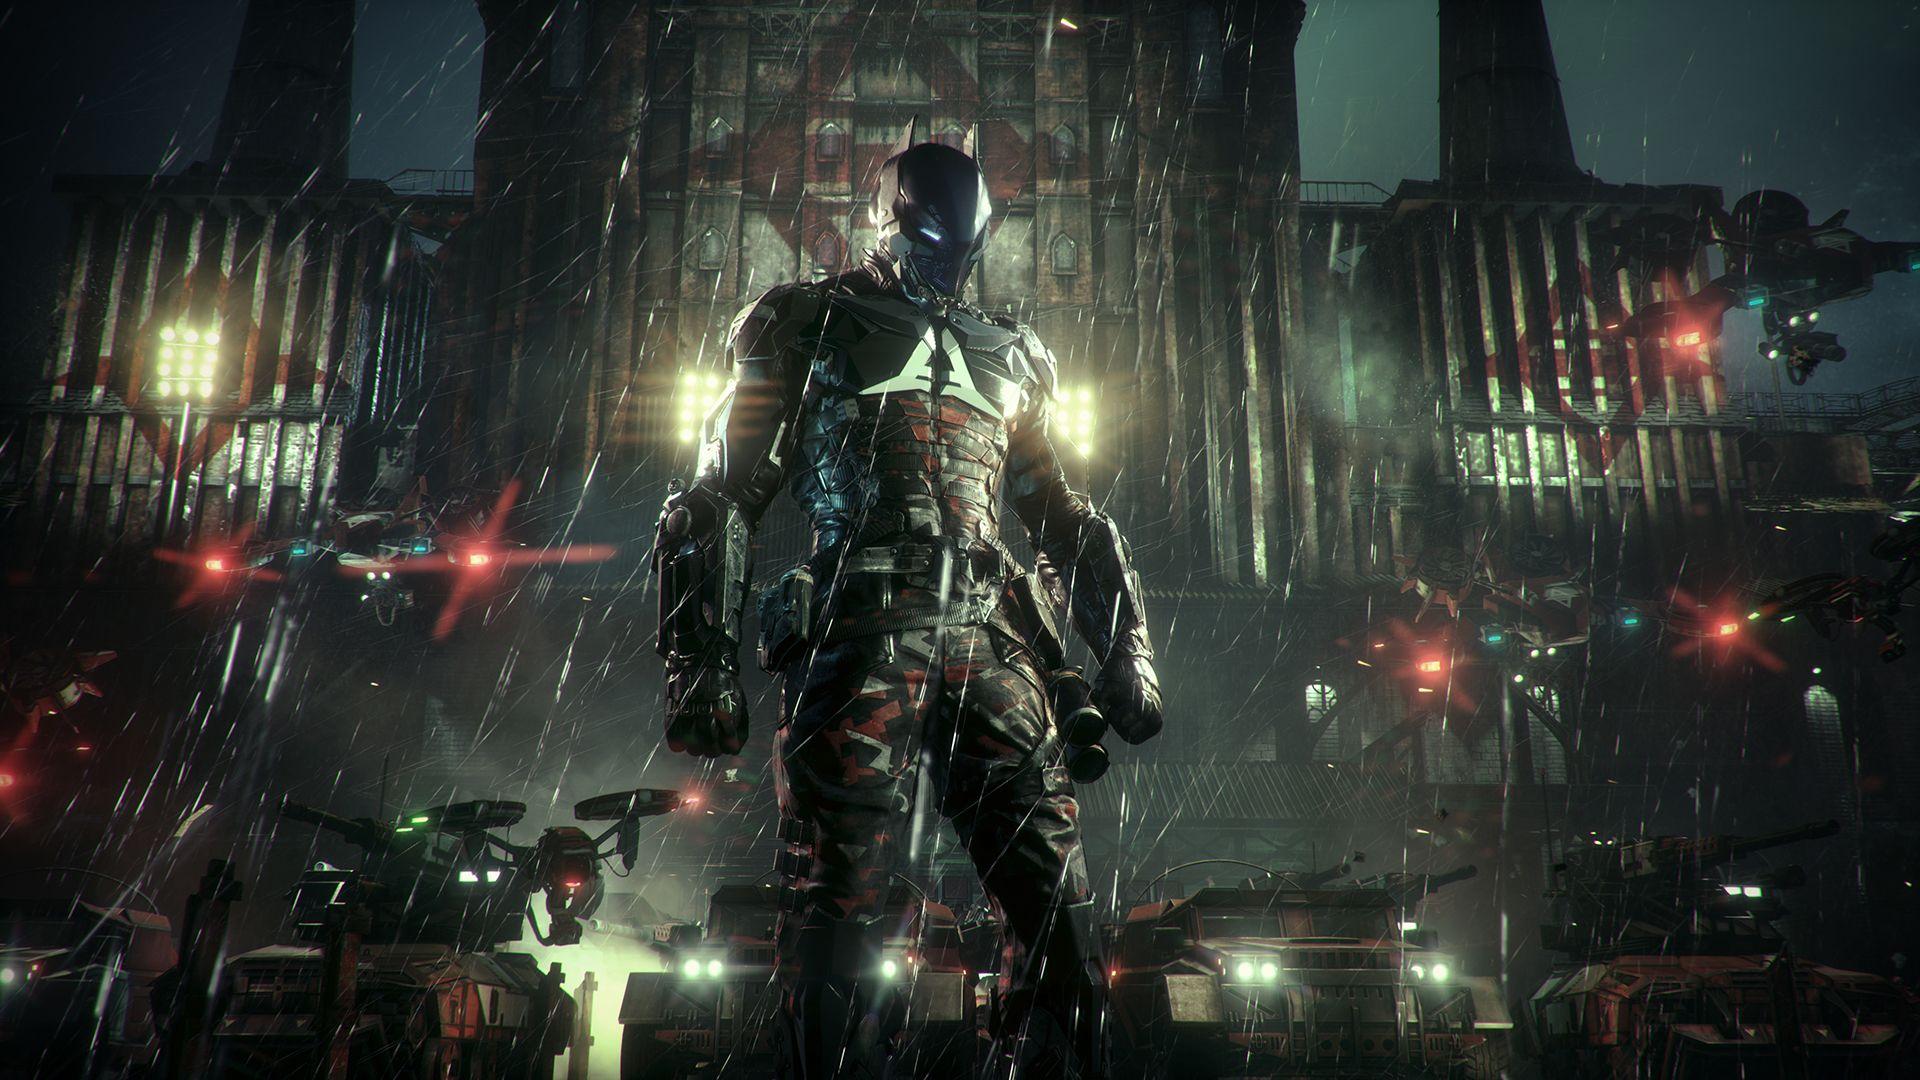 [E3 14] Batman Arkham Knight se retrasa hasta el 2015... Lweg